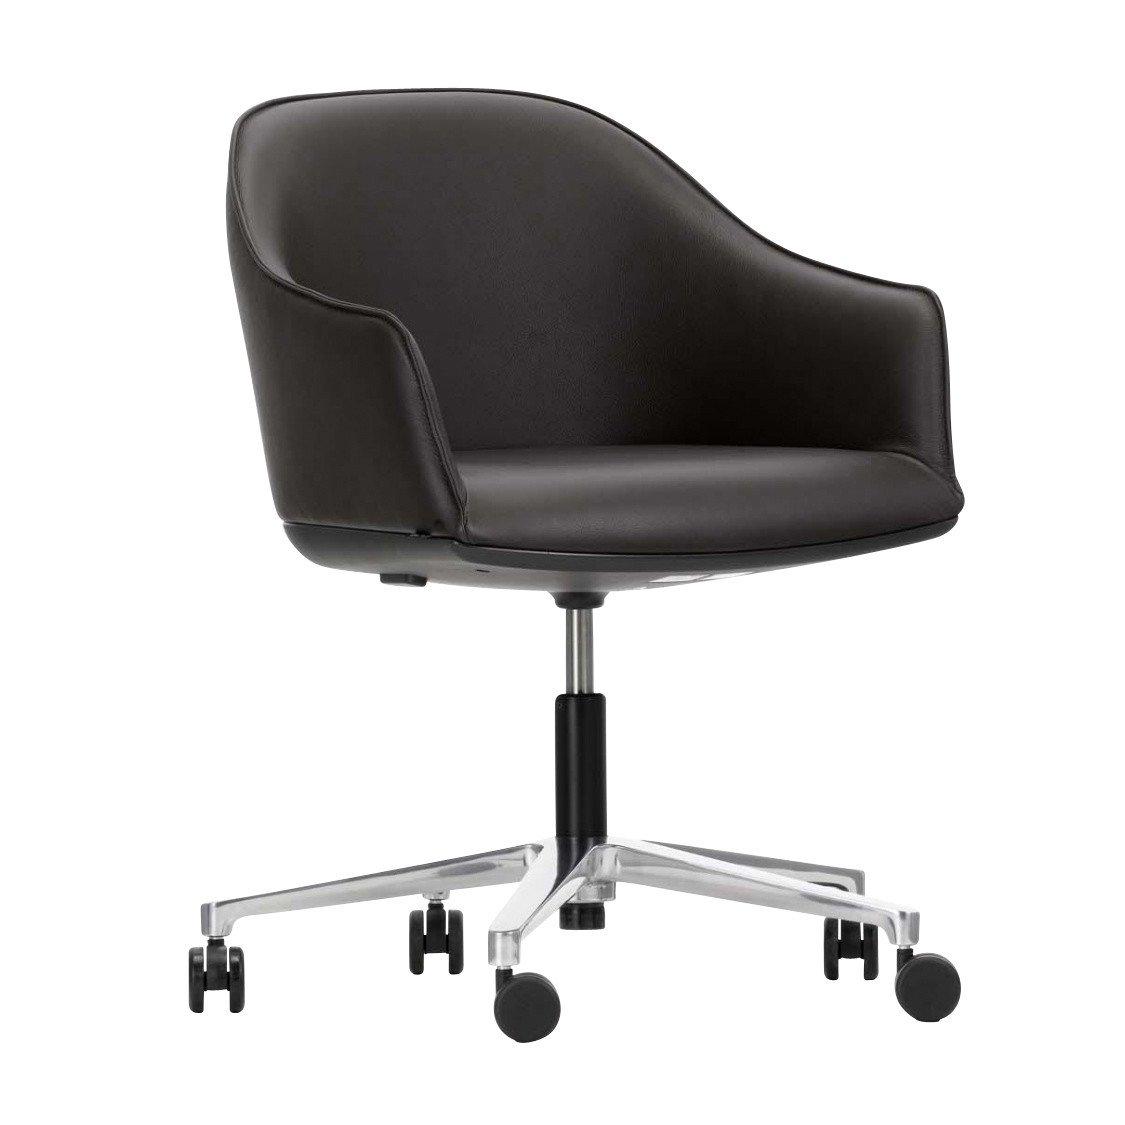 vitra softshell chair bureaustoel vitra. Black Bedroom Furniture Sets. Home Design Ideas